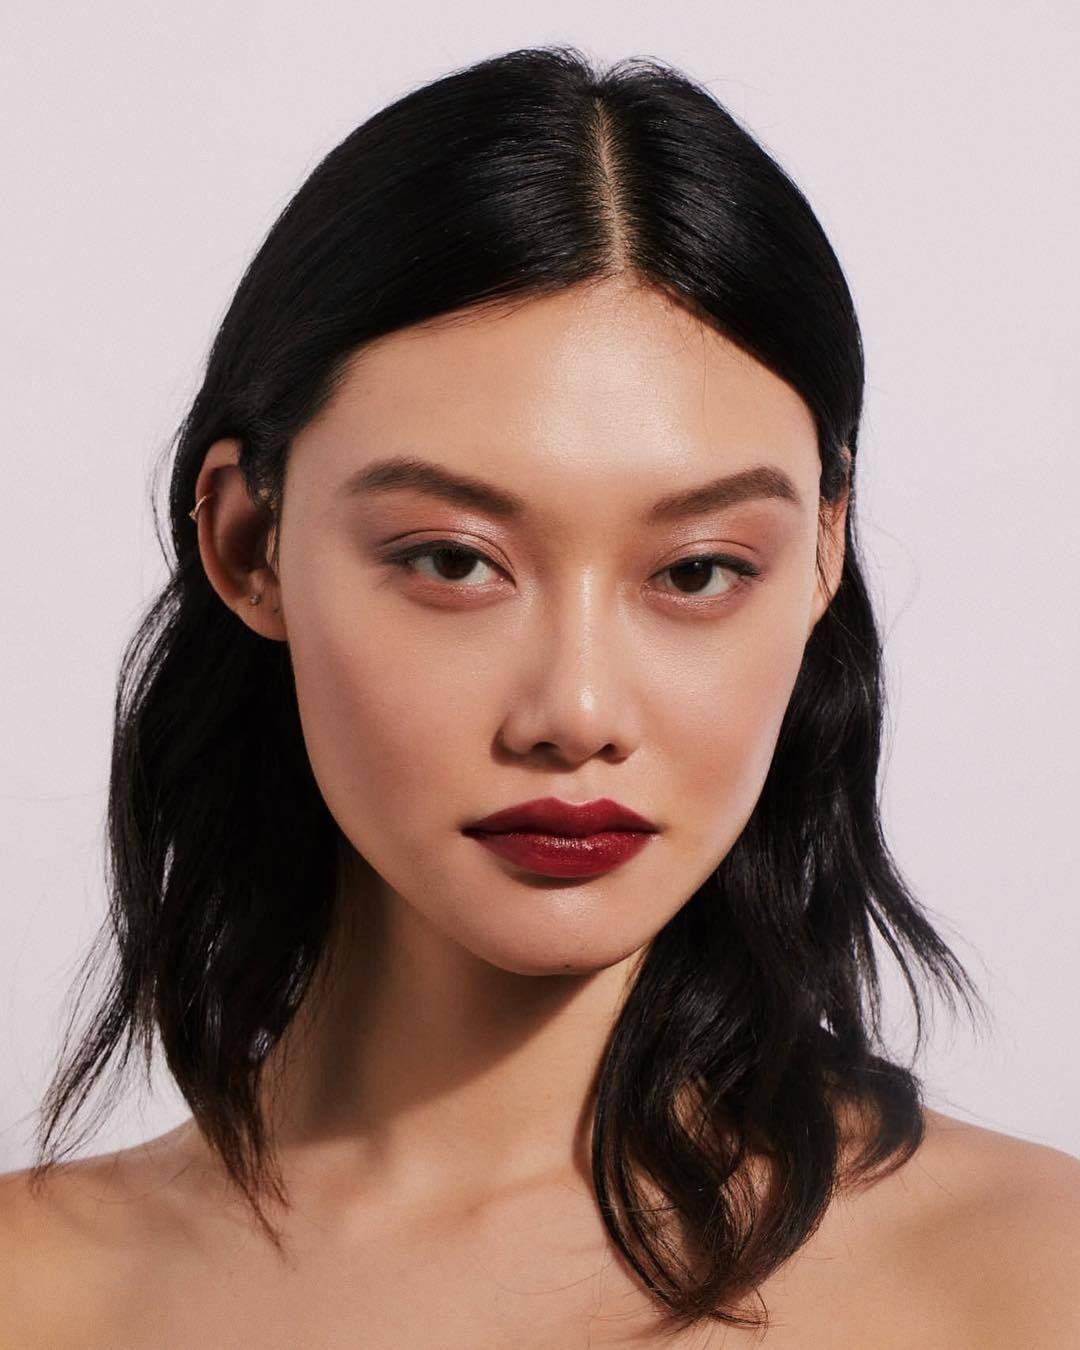 The Rough Lip Look Tutorial Long Hair Models New Makeup Ideas